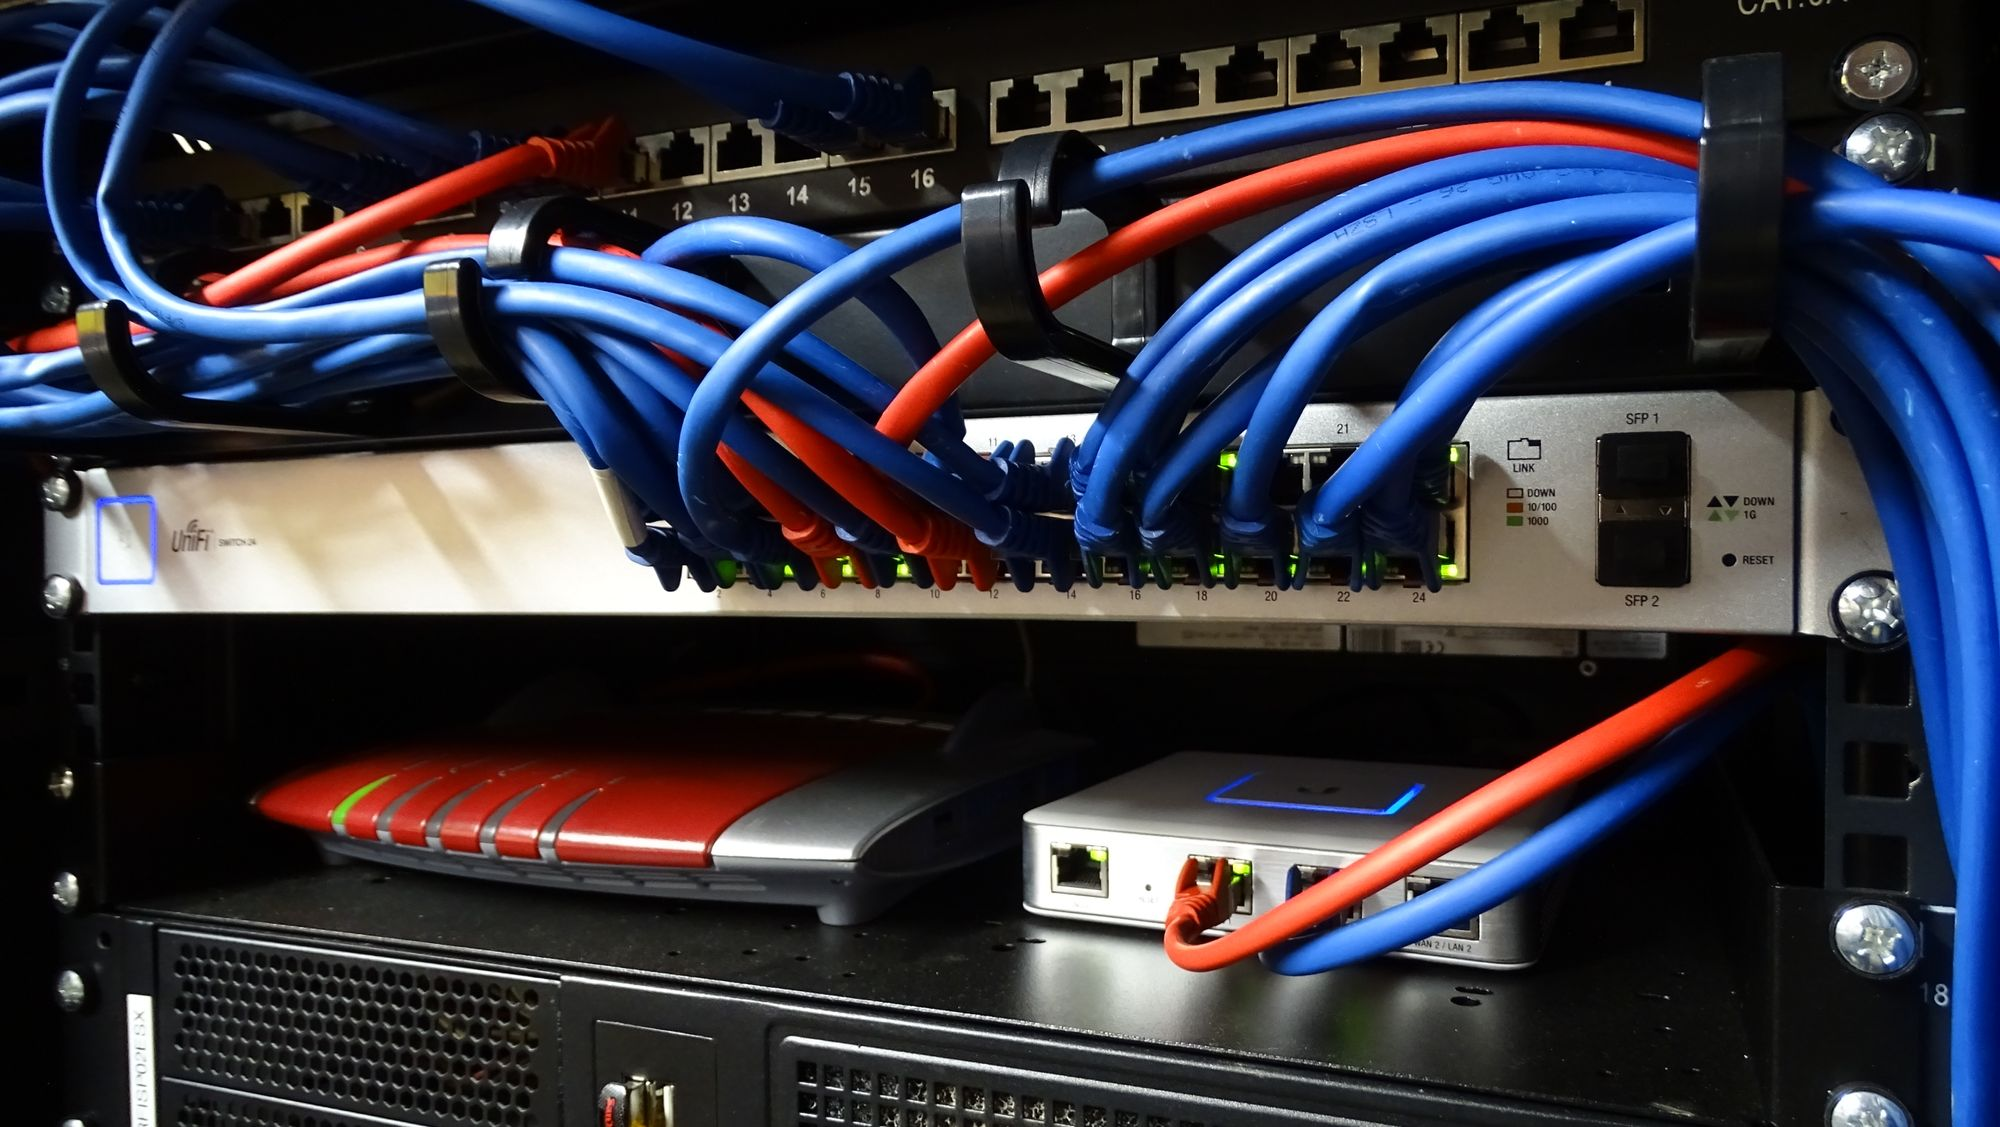 home network 2 0 | Ubiquiti Community